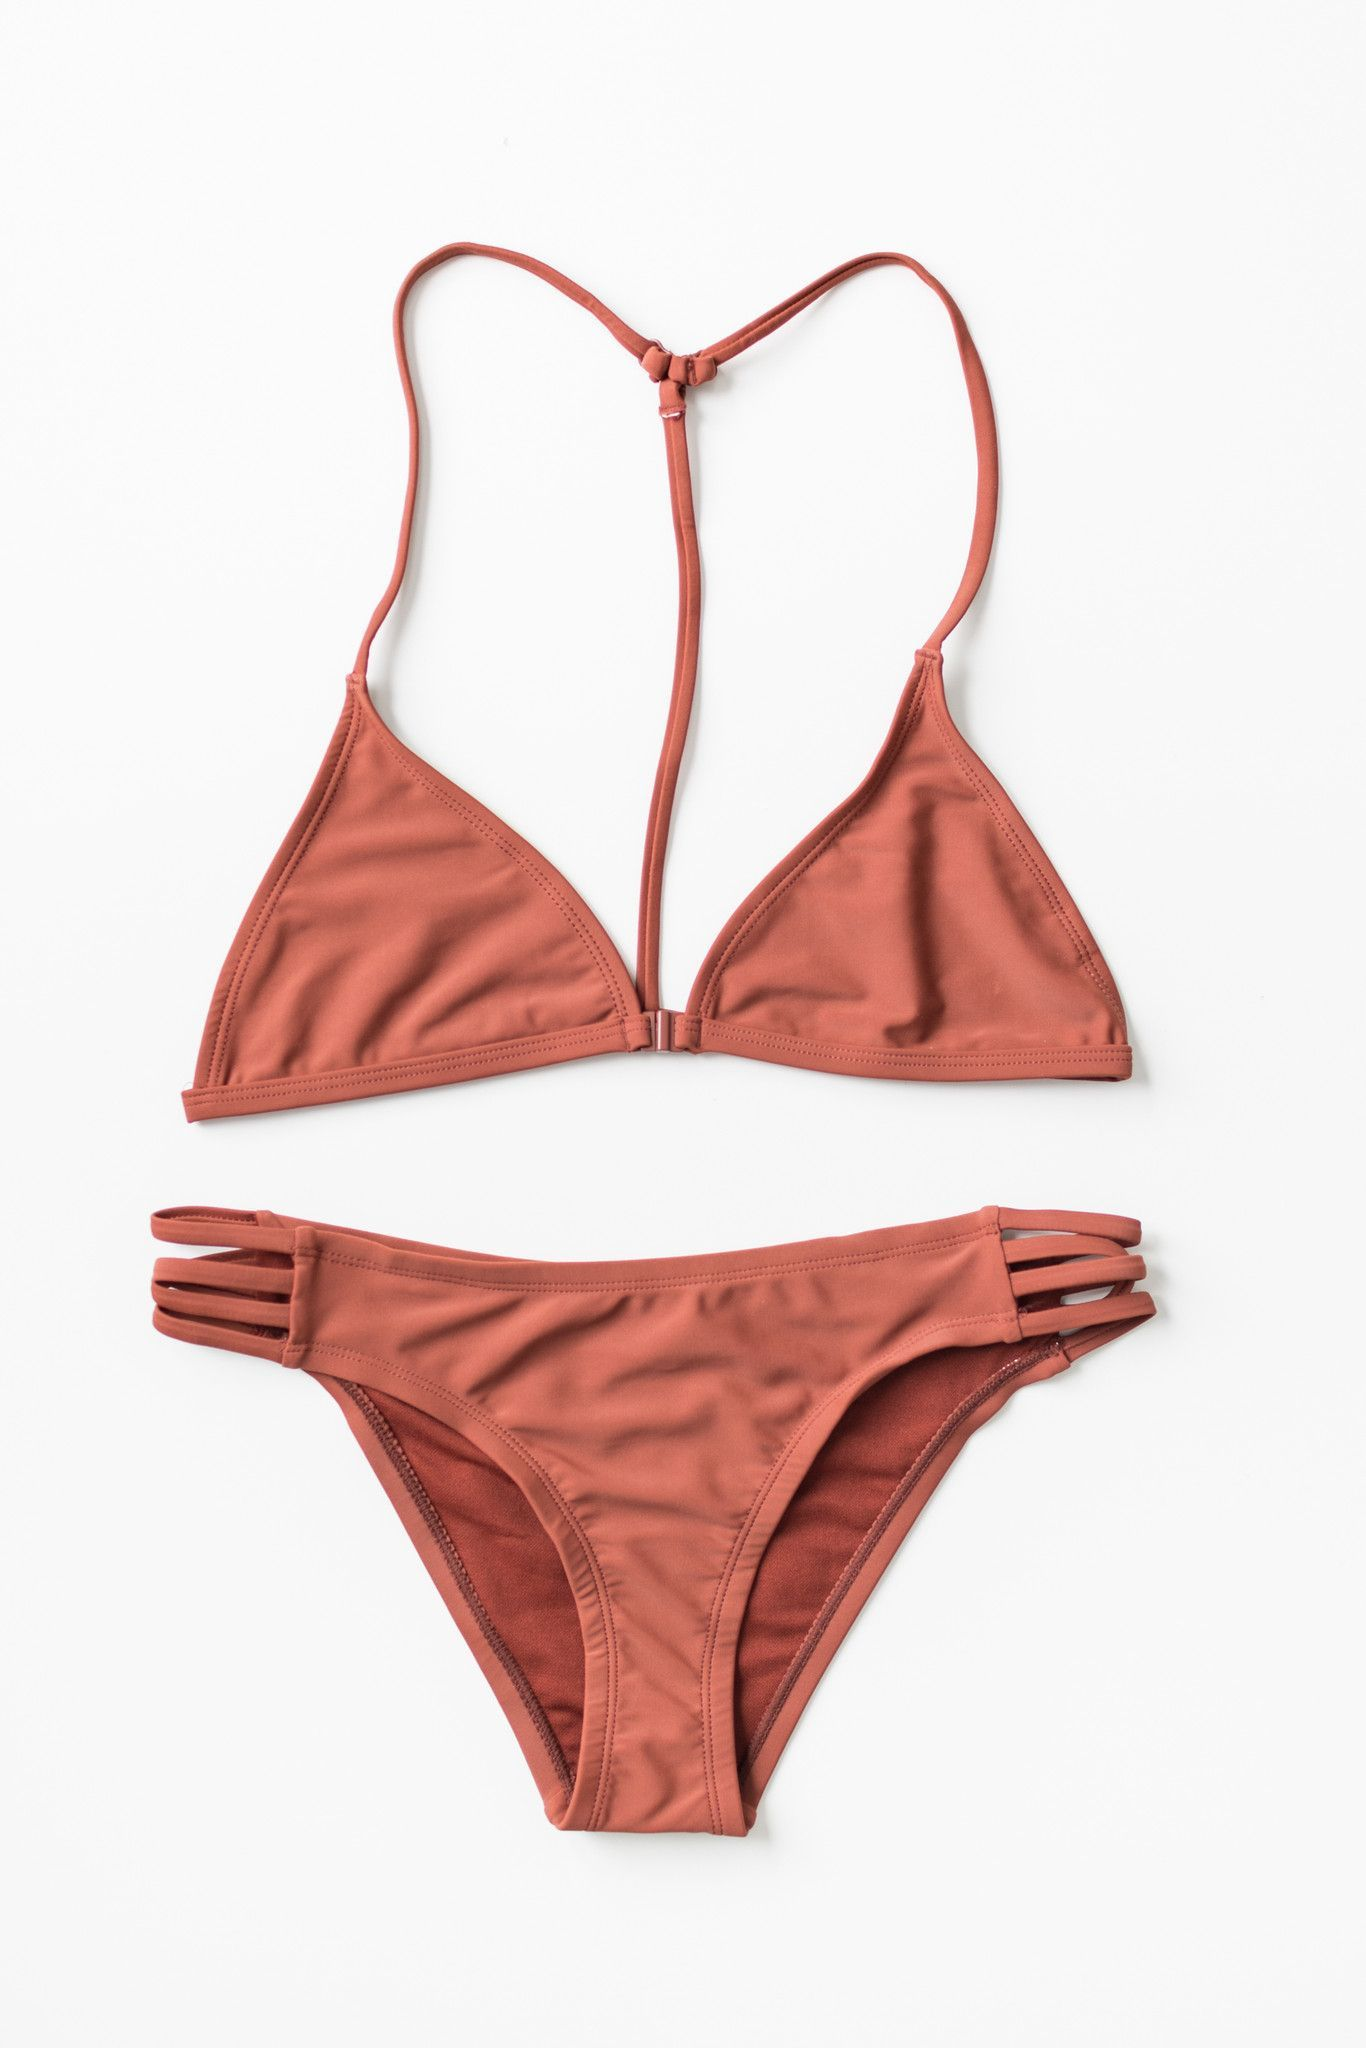 290131c207d40 Rust Bikini Set